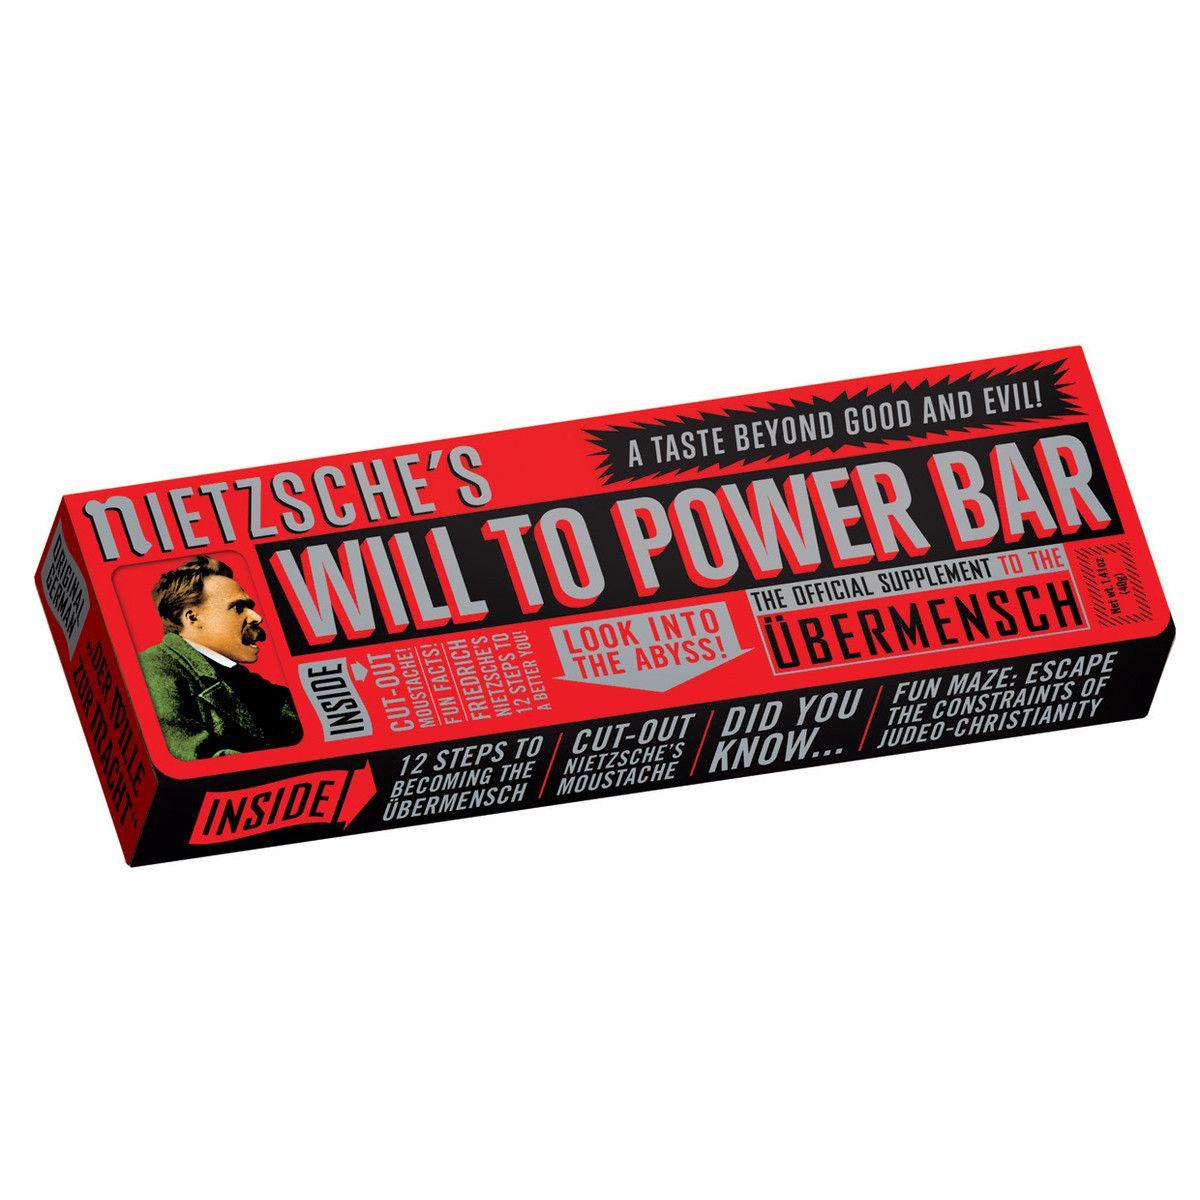 Nietzsche Will To Power Bar Hahaha Power Bars Nietzsche Will To Power Beyond Good And Evil